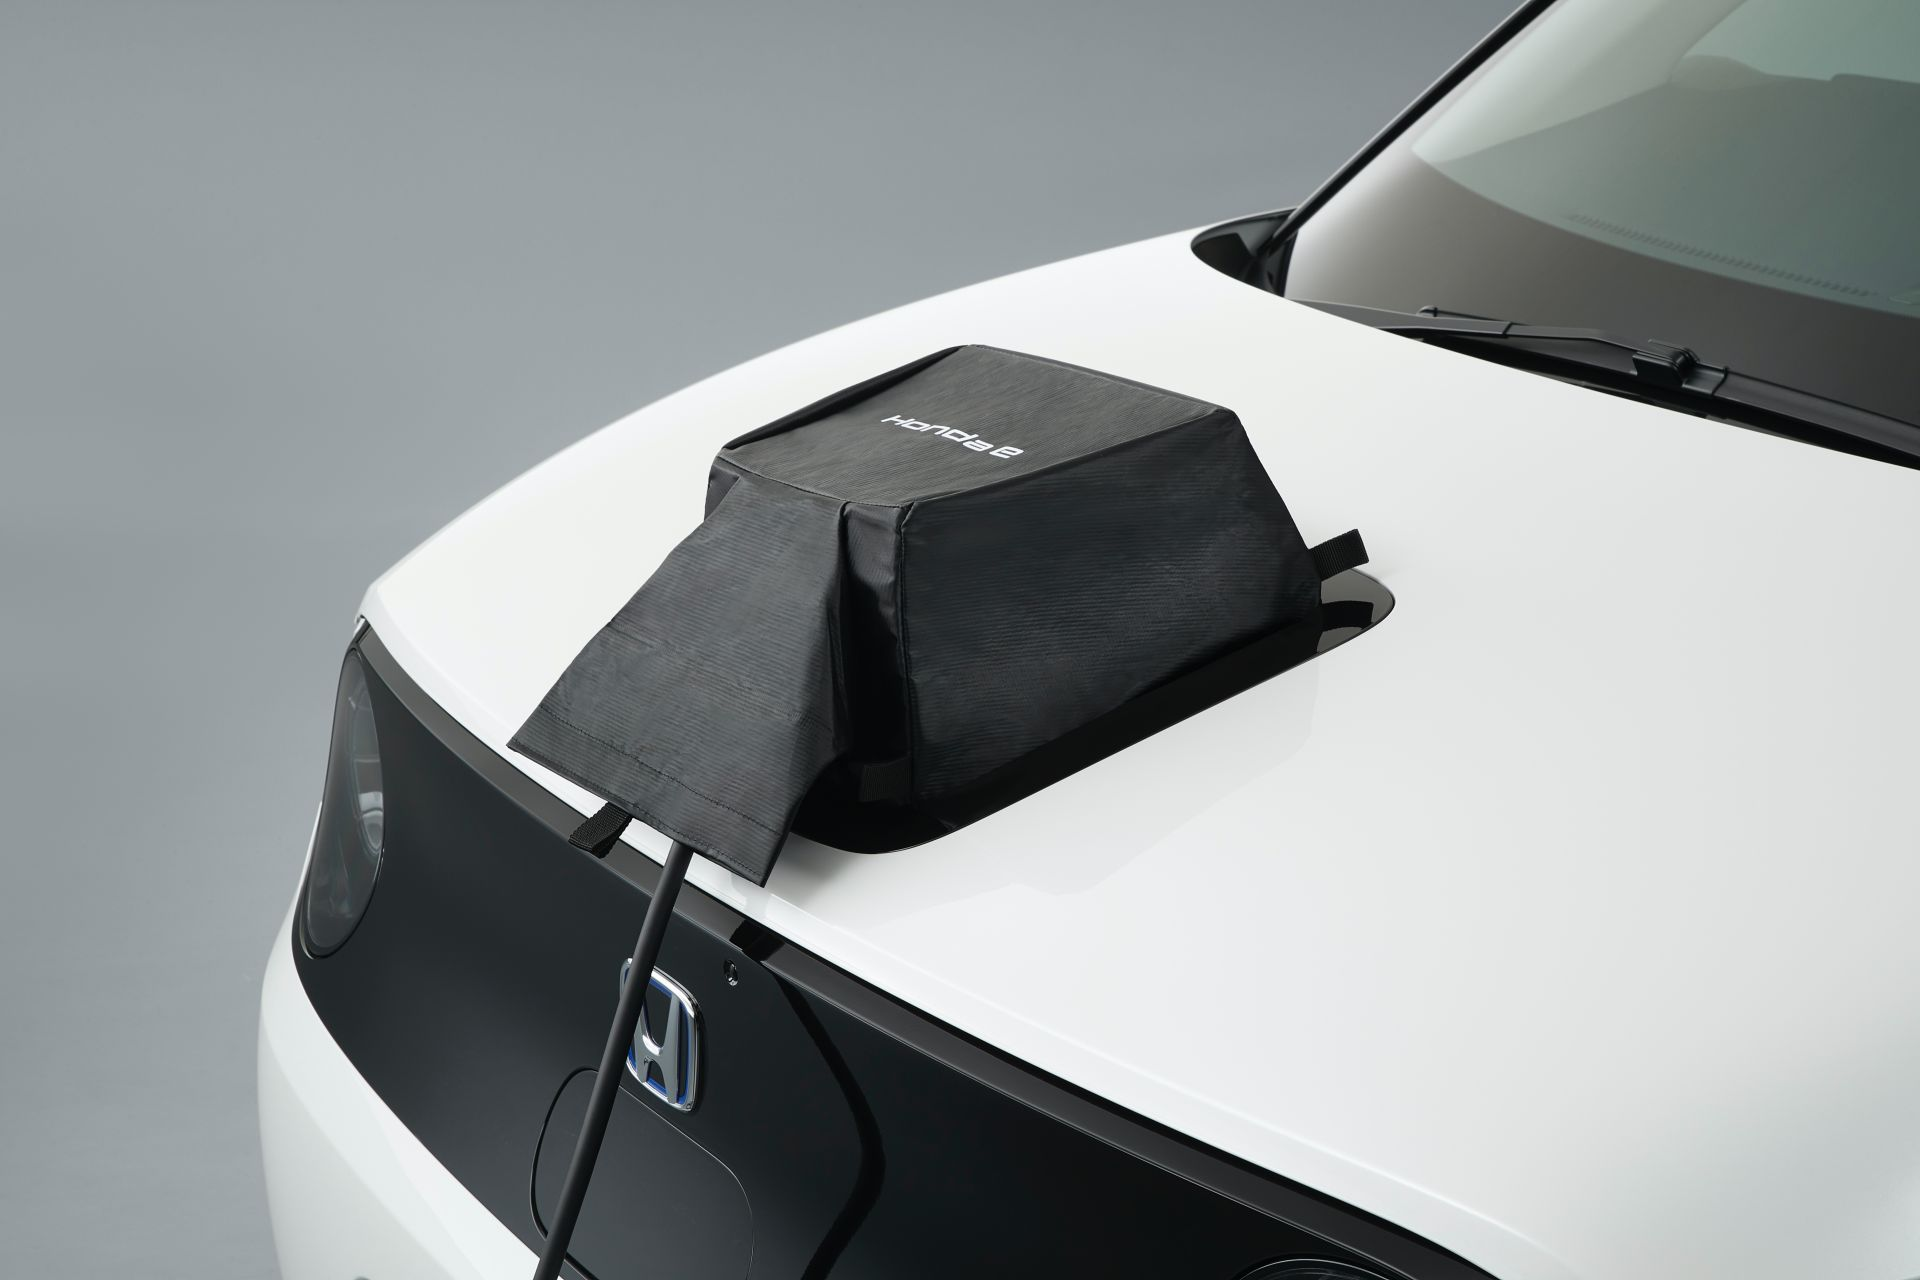 2021-Honda-e-genuine-accessories-JDM-spec-15